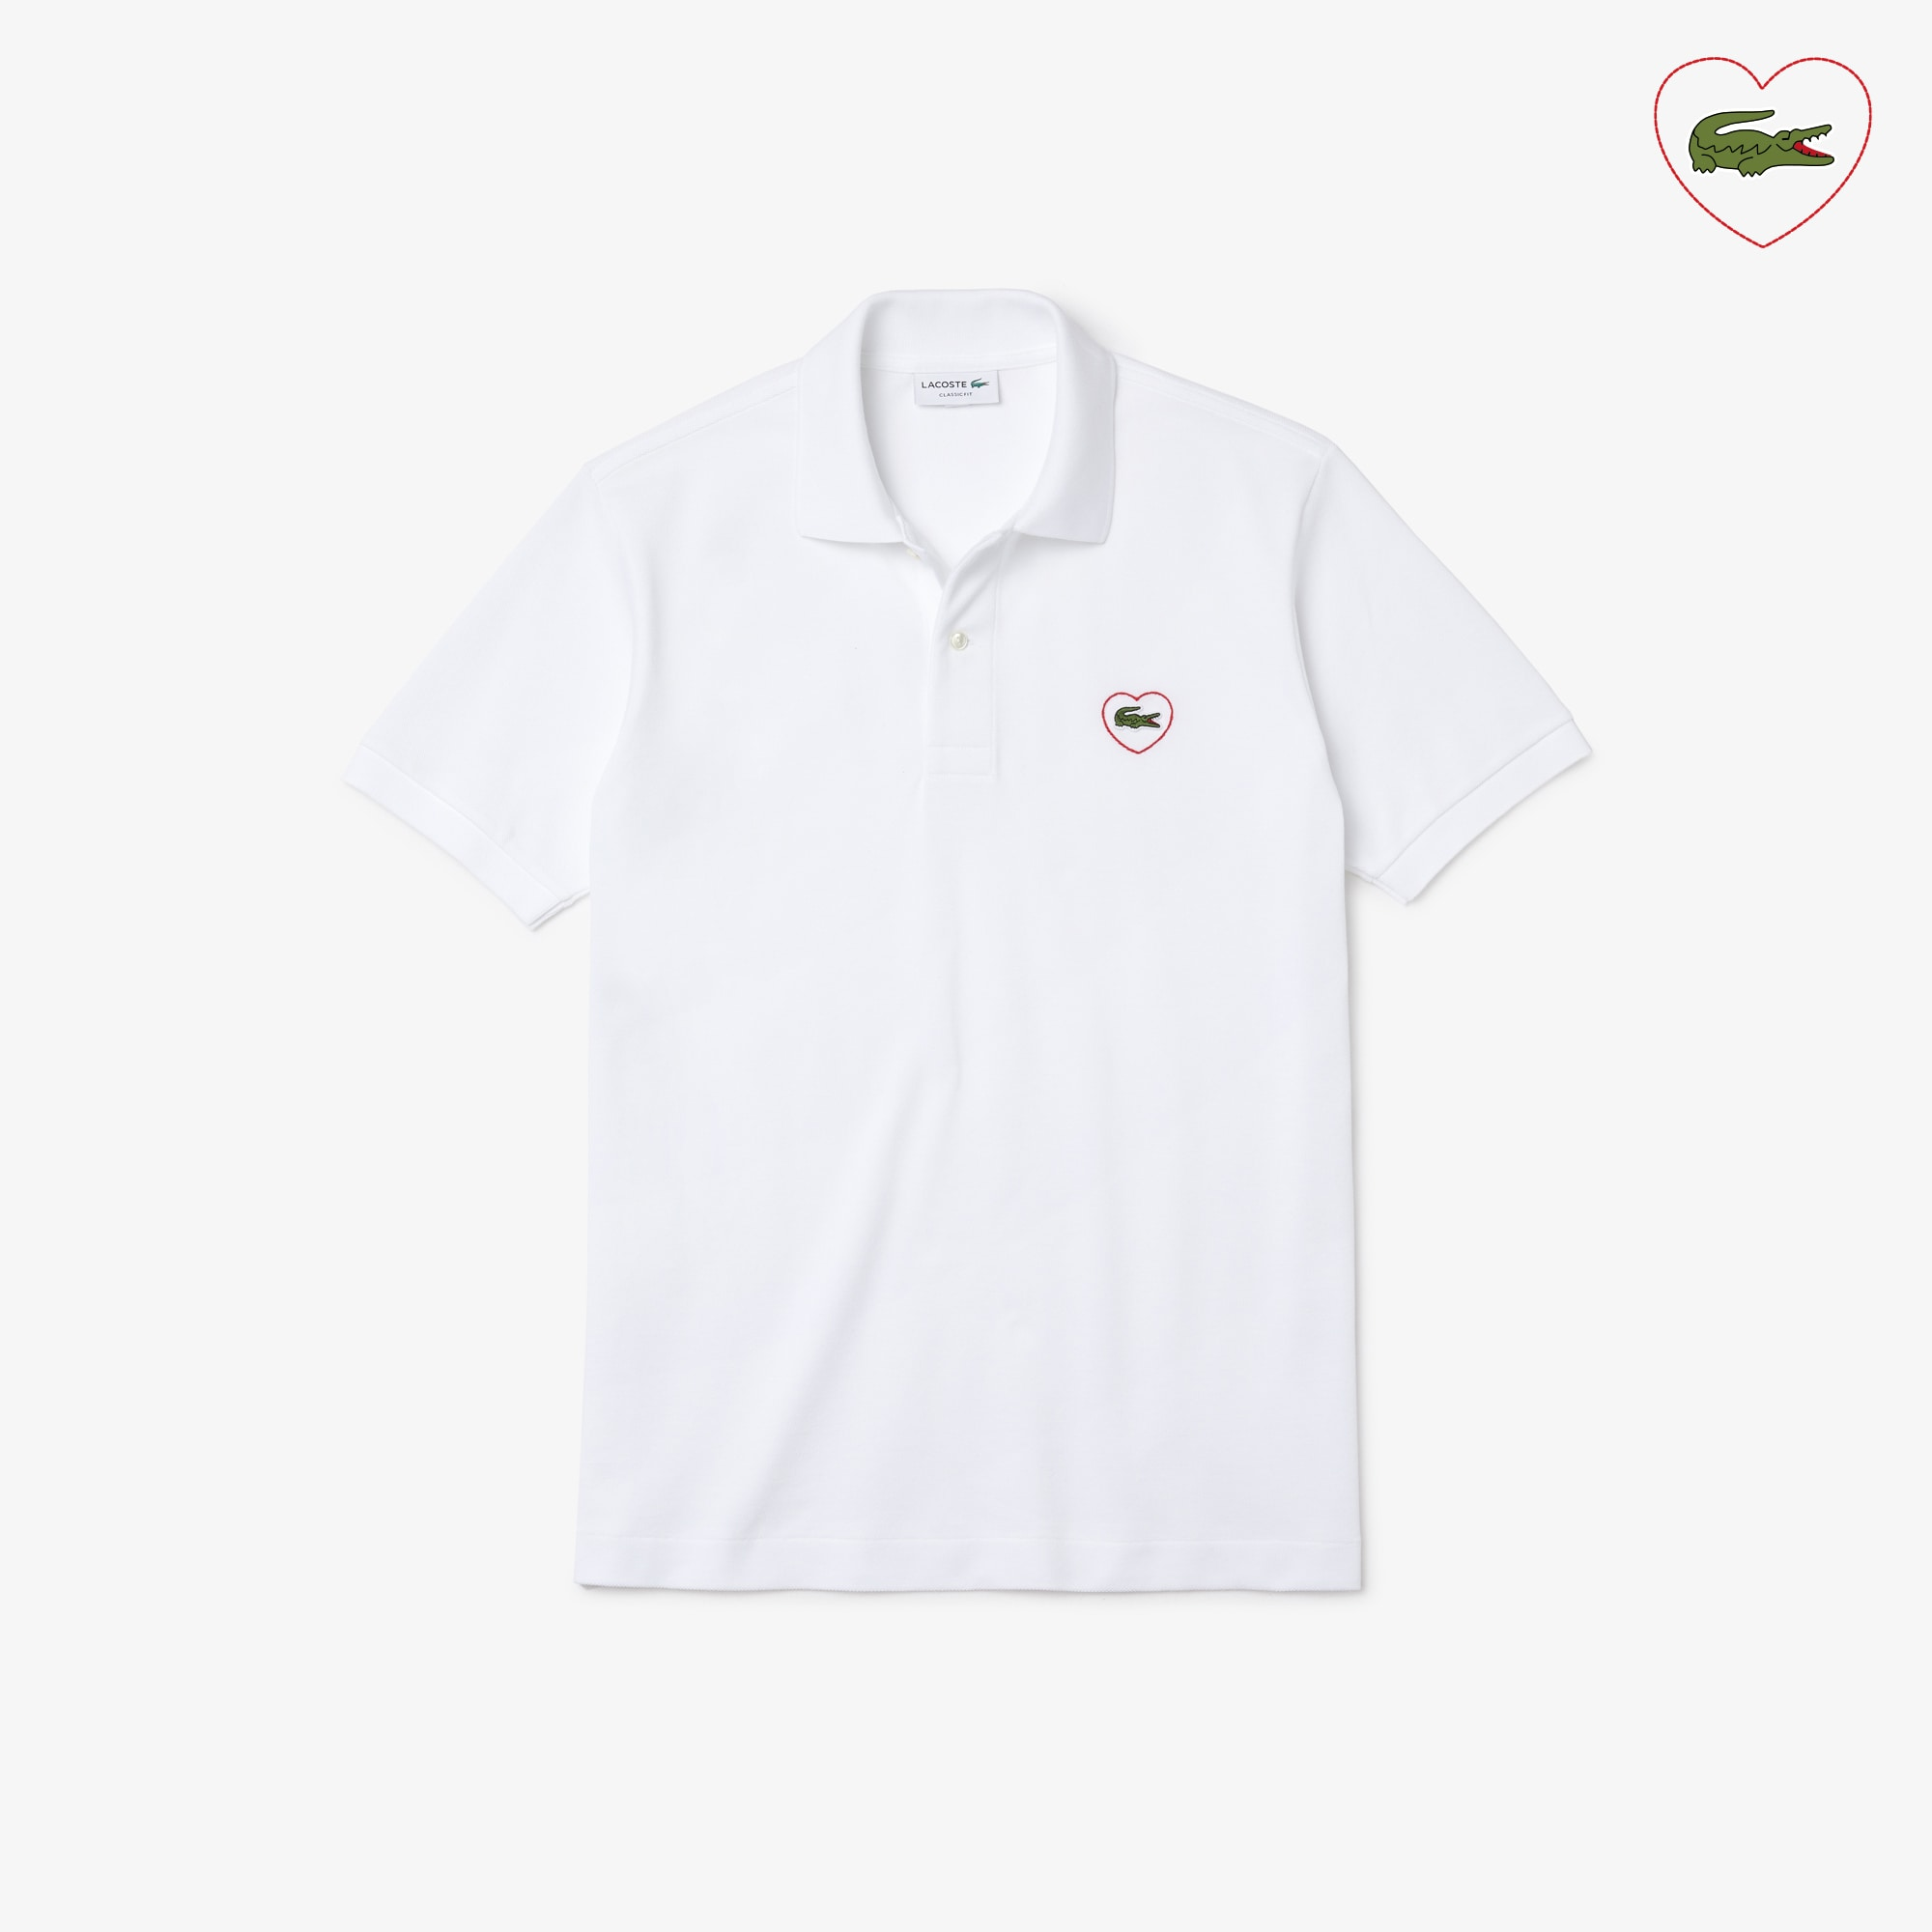 Unisex L.12.12  Polo Merci in Cotton Piqué